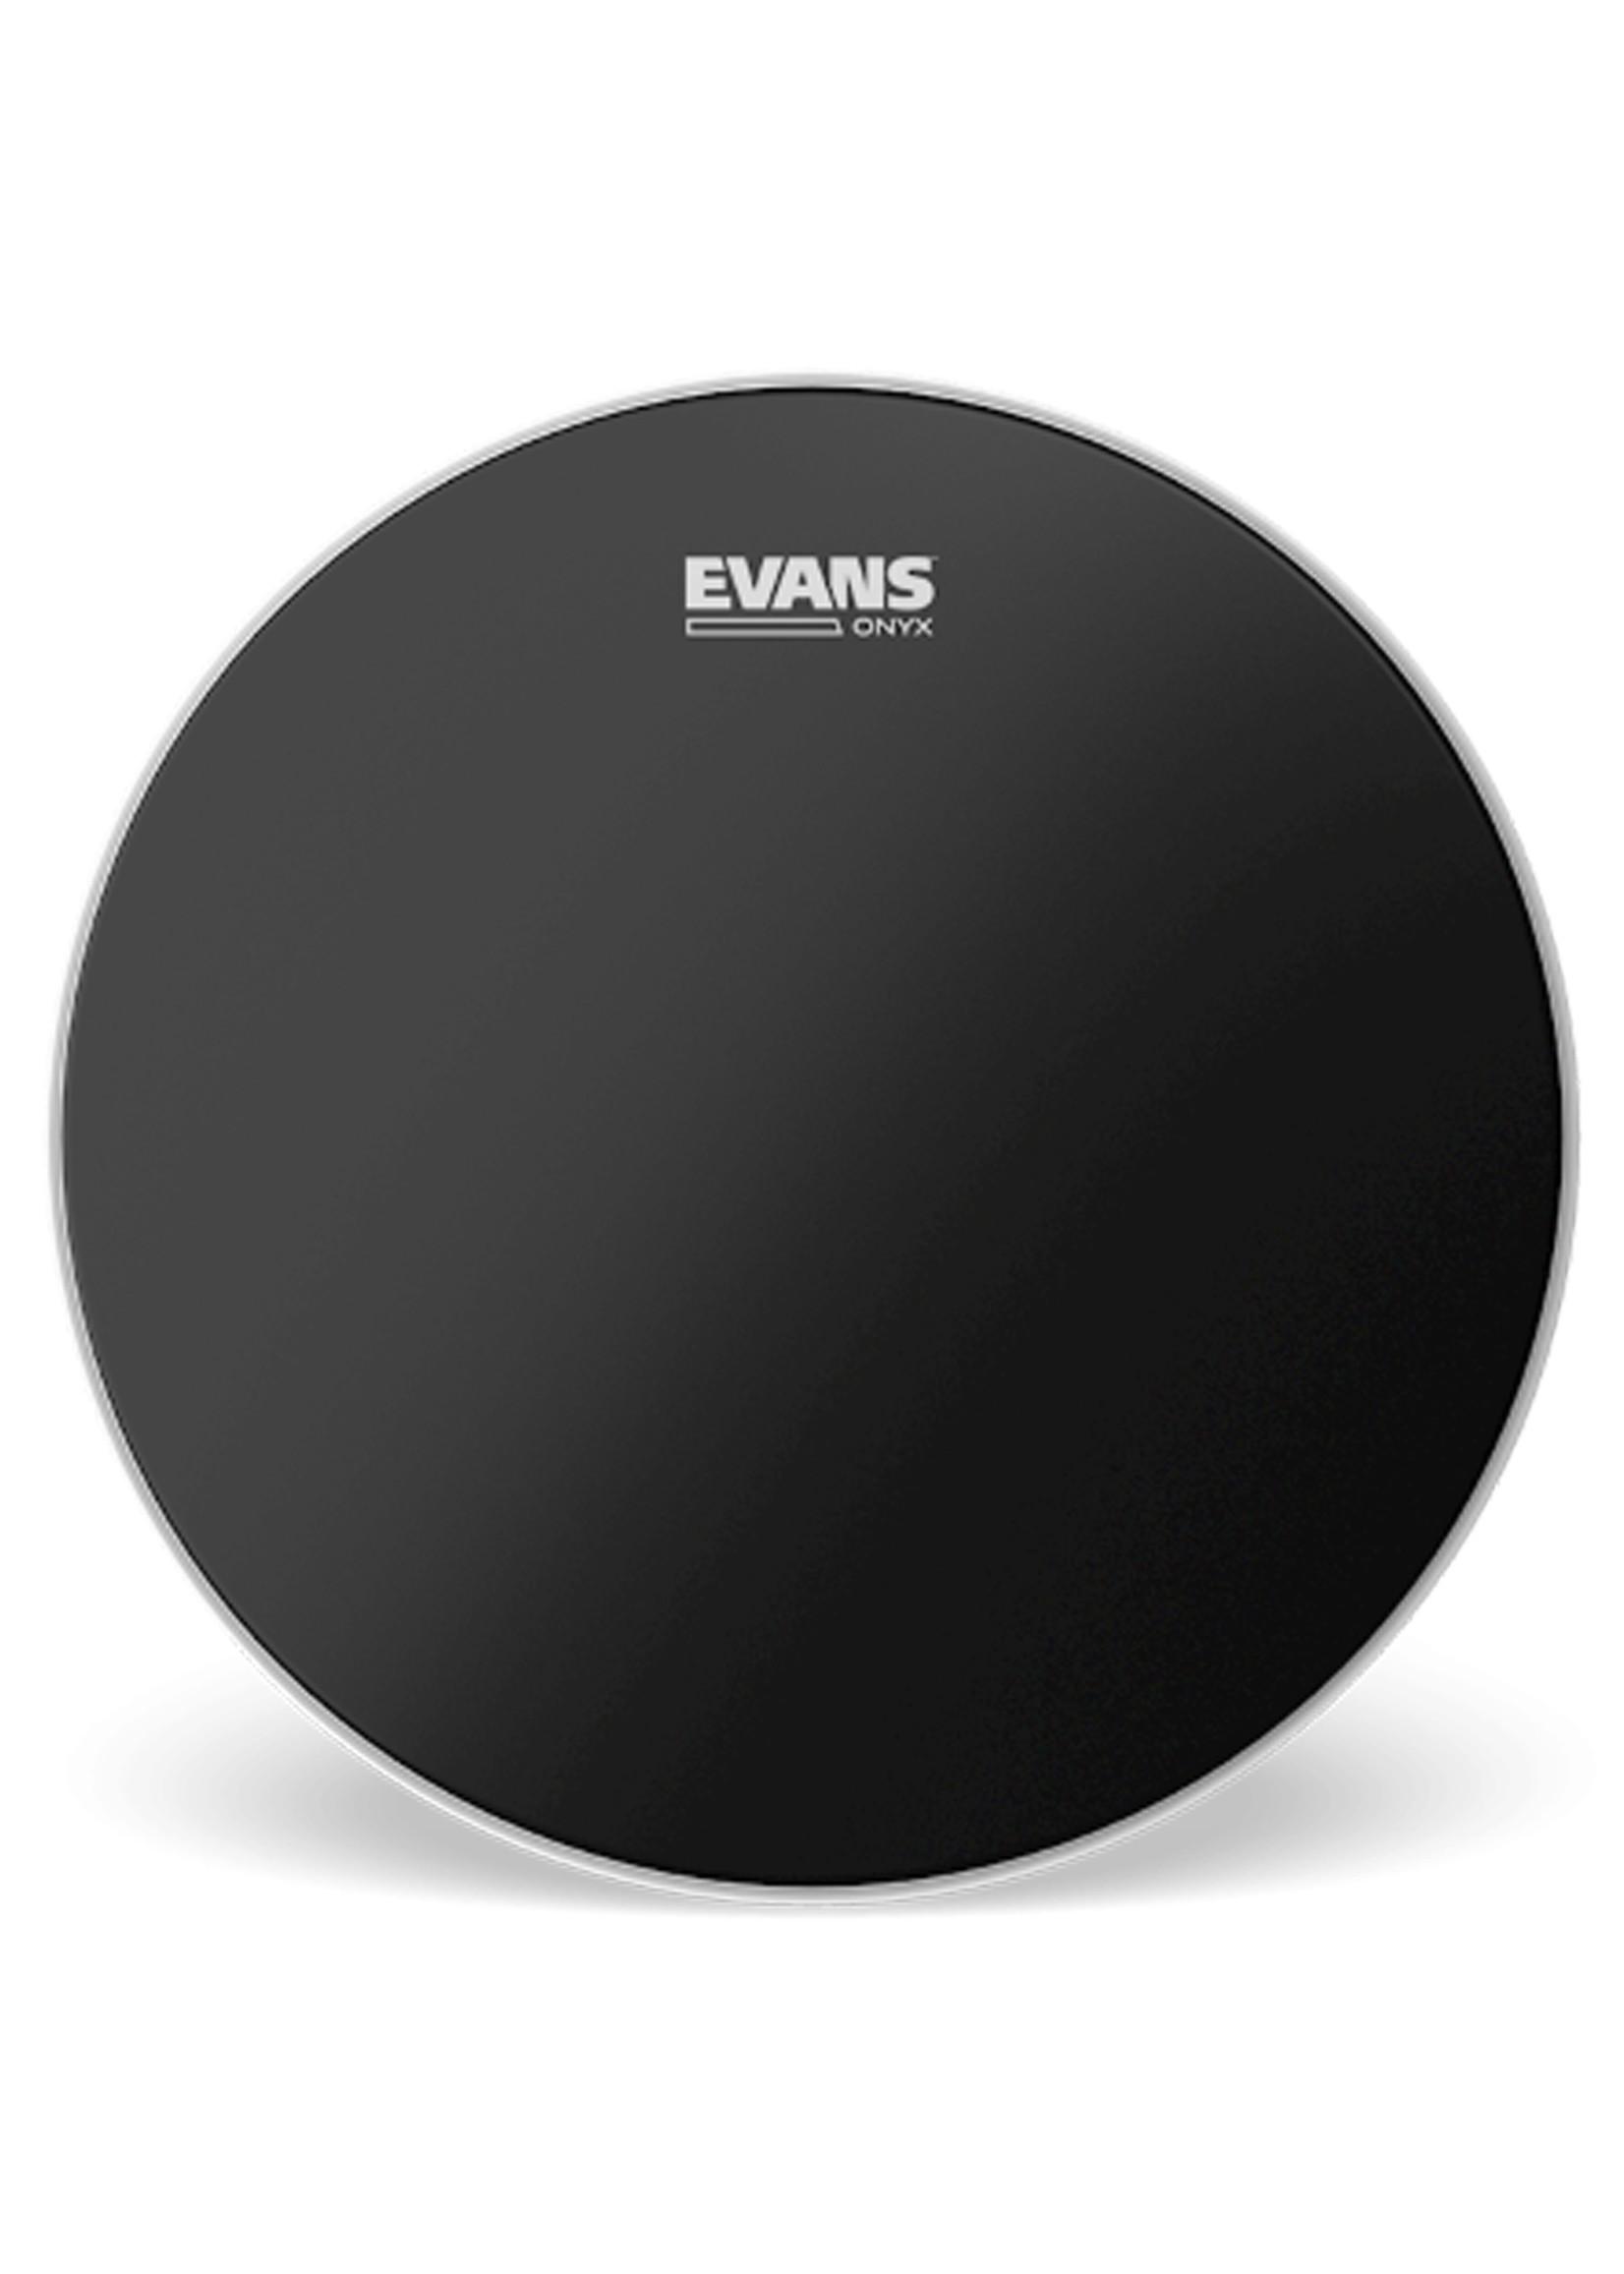 "Evans Evans 12"" Onyx"